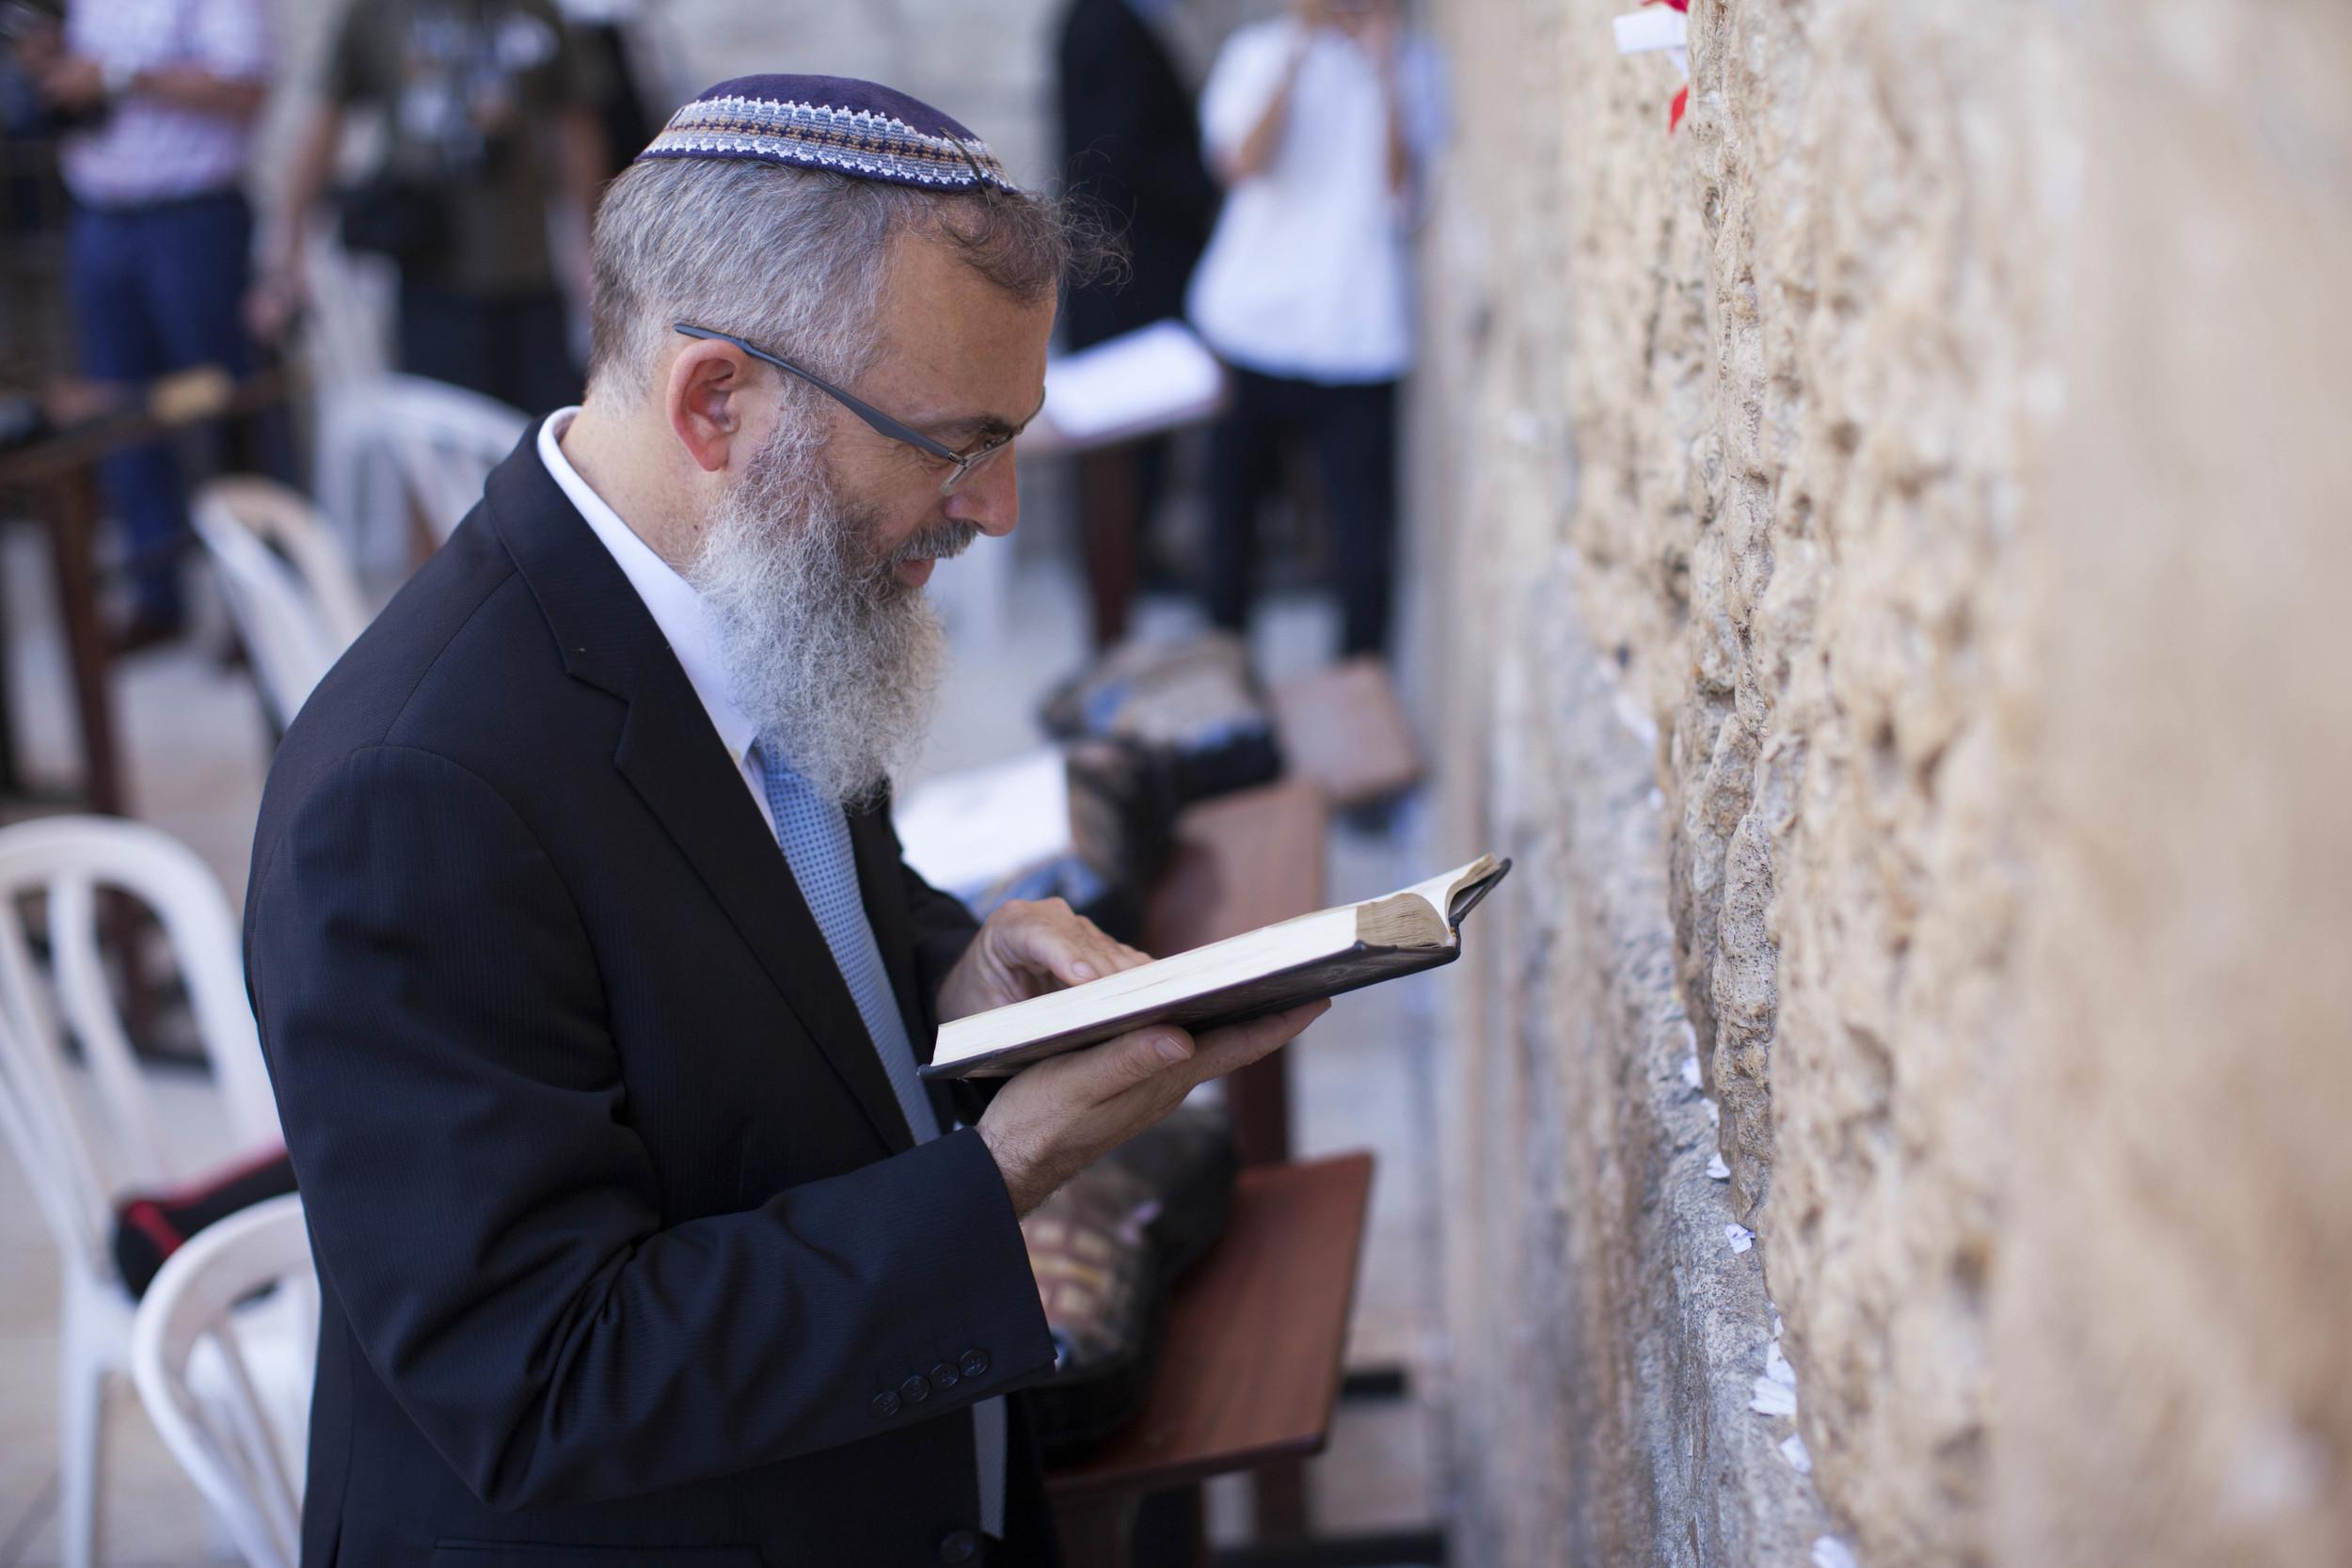 Click photo to download. Caption: Rabbi David Stav visits the Western Wall in Jerusalem on July 24, 2013. Credit: Yonatan Sindel/Flash90.